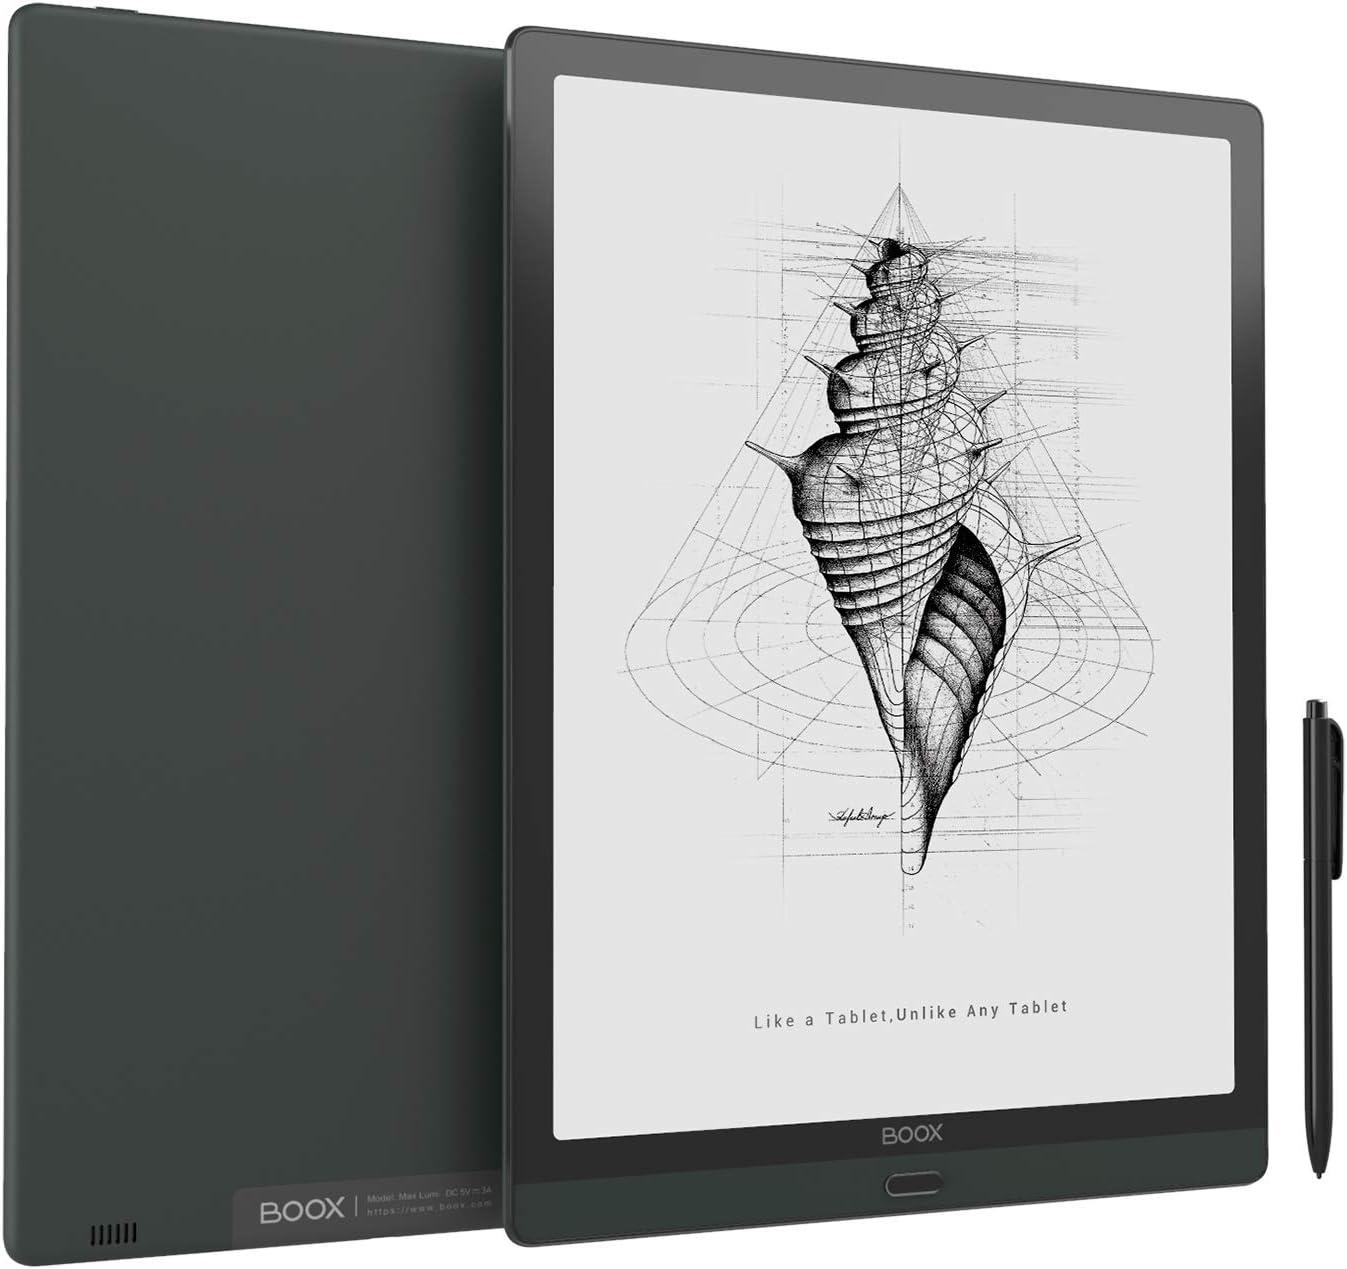 BOOX Max Lumi 13.3 ePaper, Front Light, Android 10, Fingerprint Recognition, 207dpi, BT 5.0 Digital Paper 4G 64G